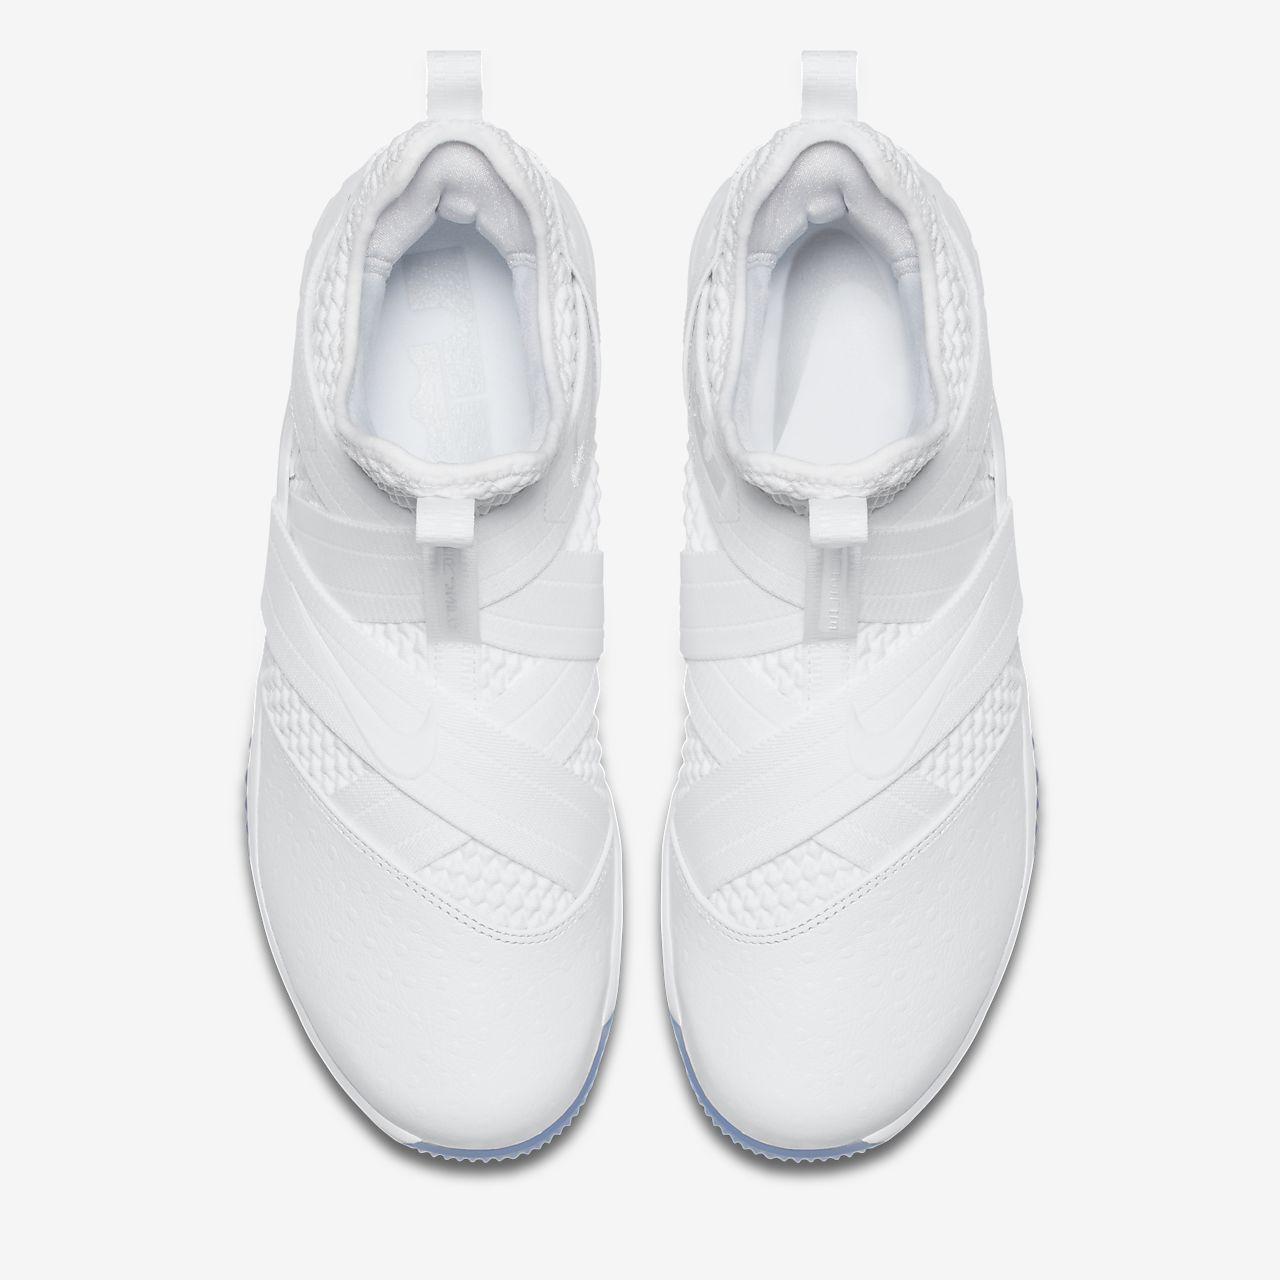 dc46a64f937d LeBron Soldier 12 SFG Basketball Shoe. Nike.com GB